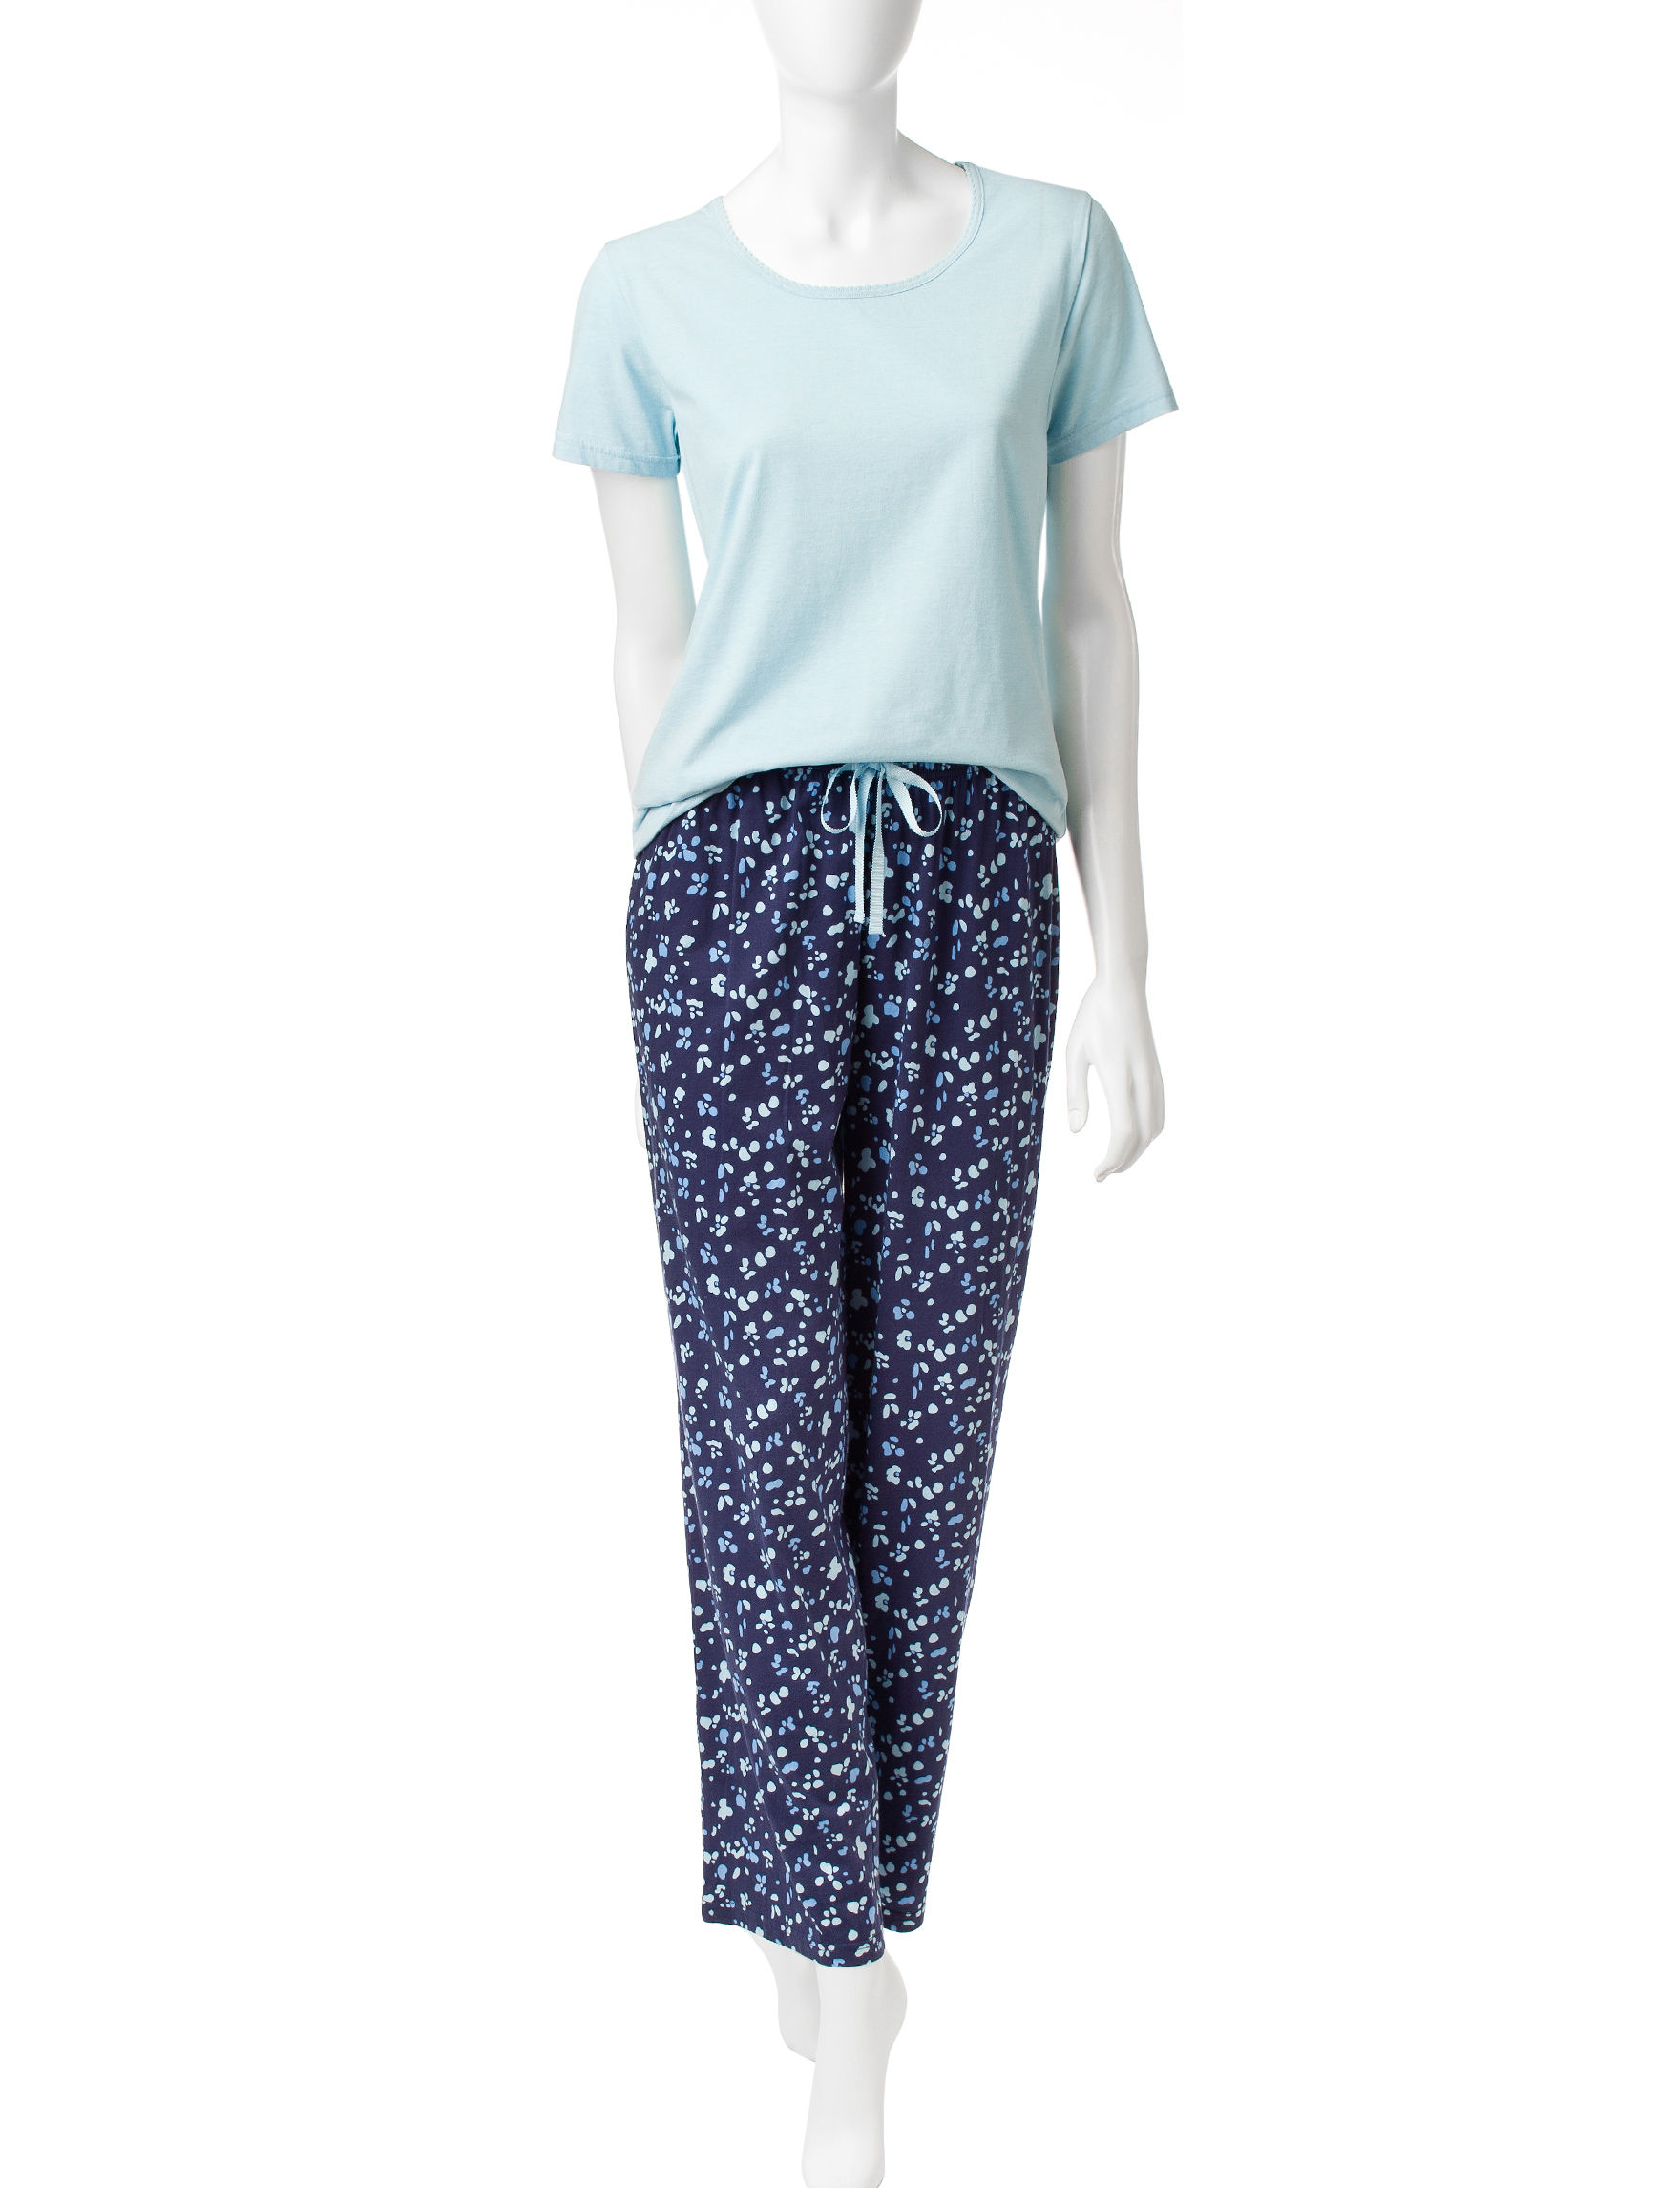 Hanes Navy Pajama Sets